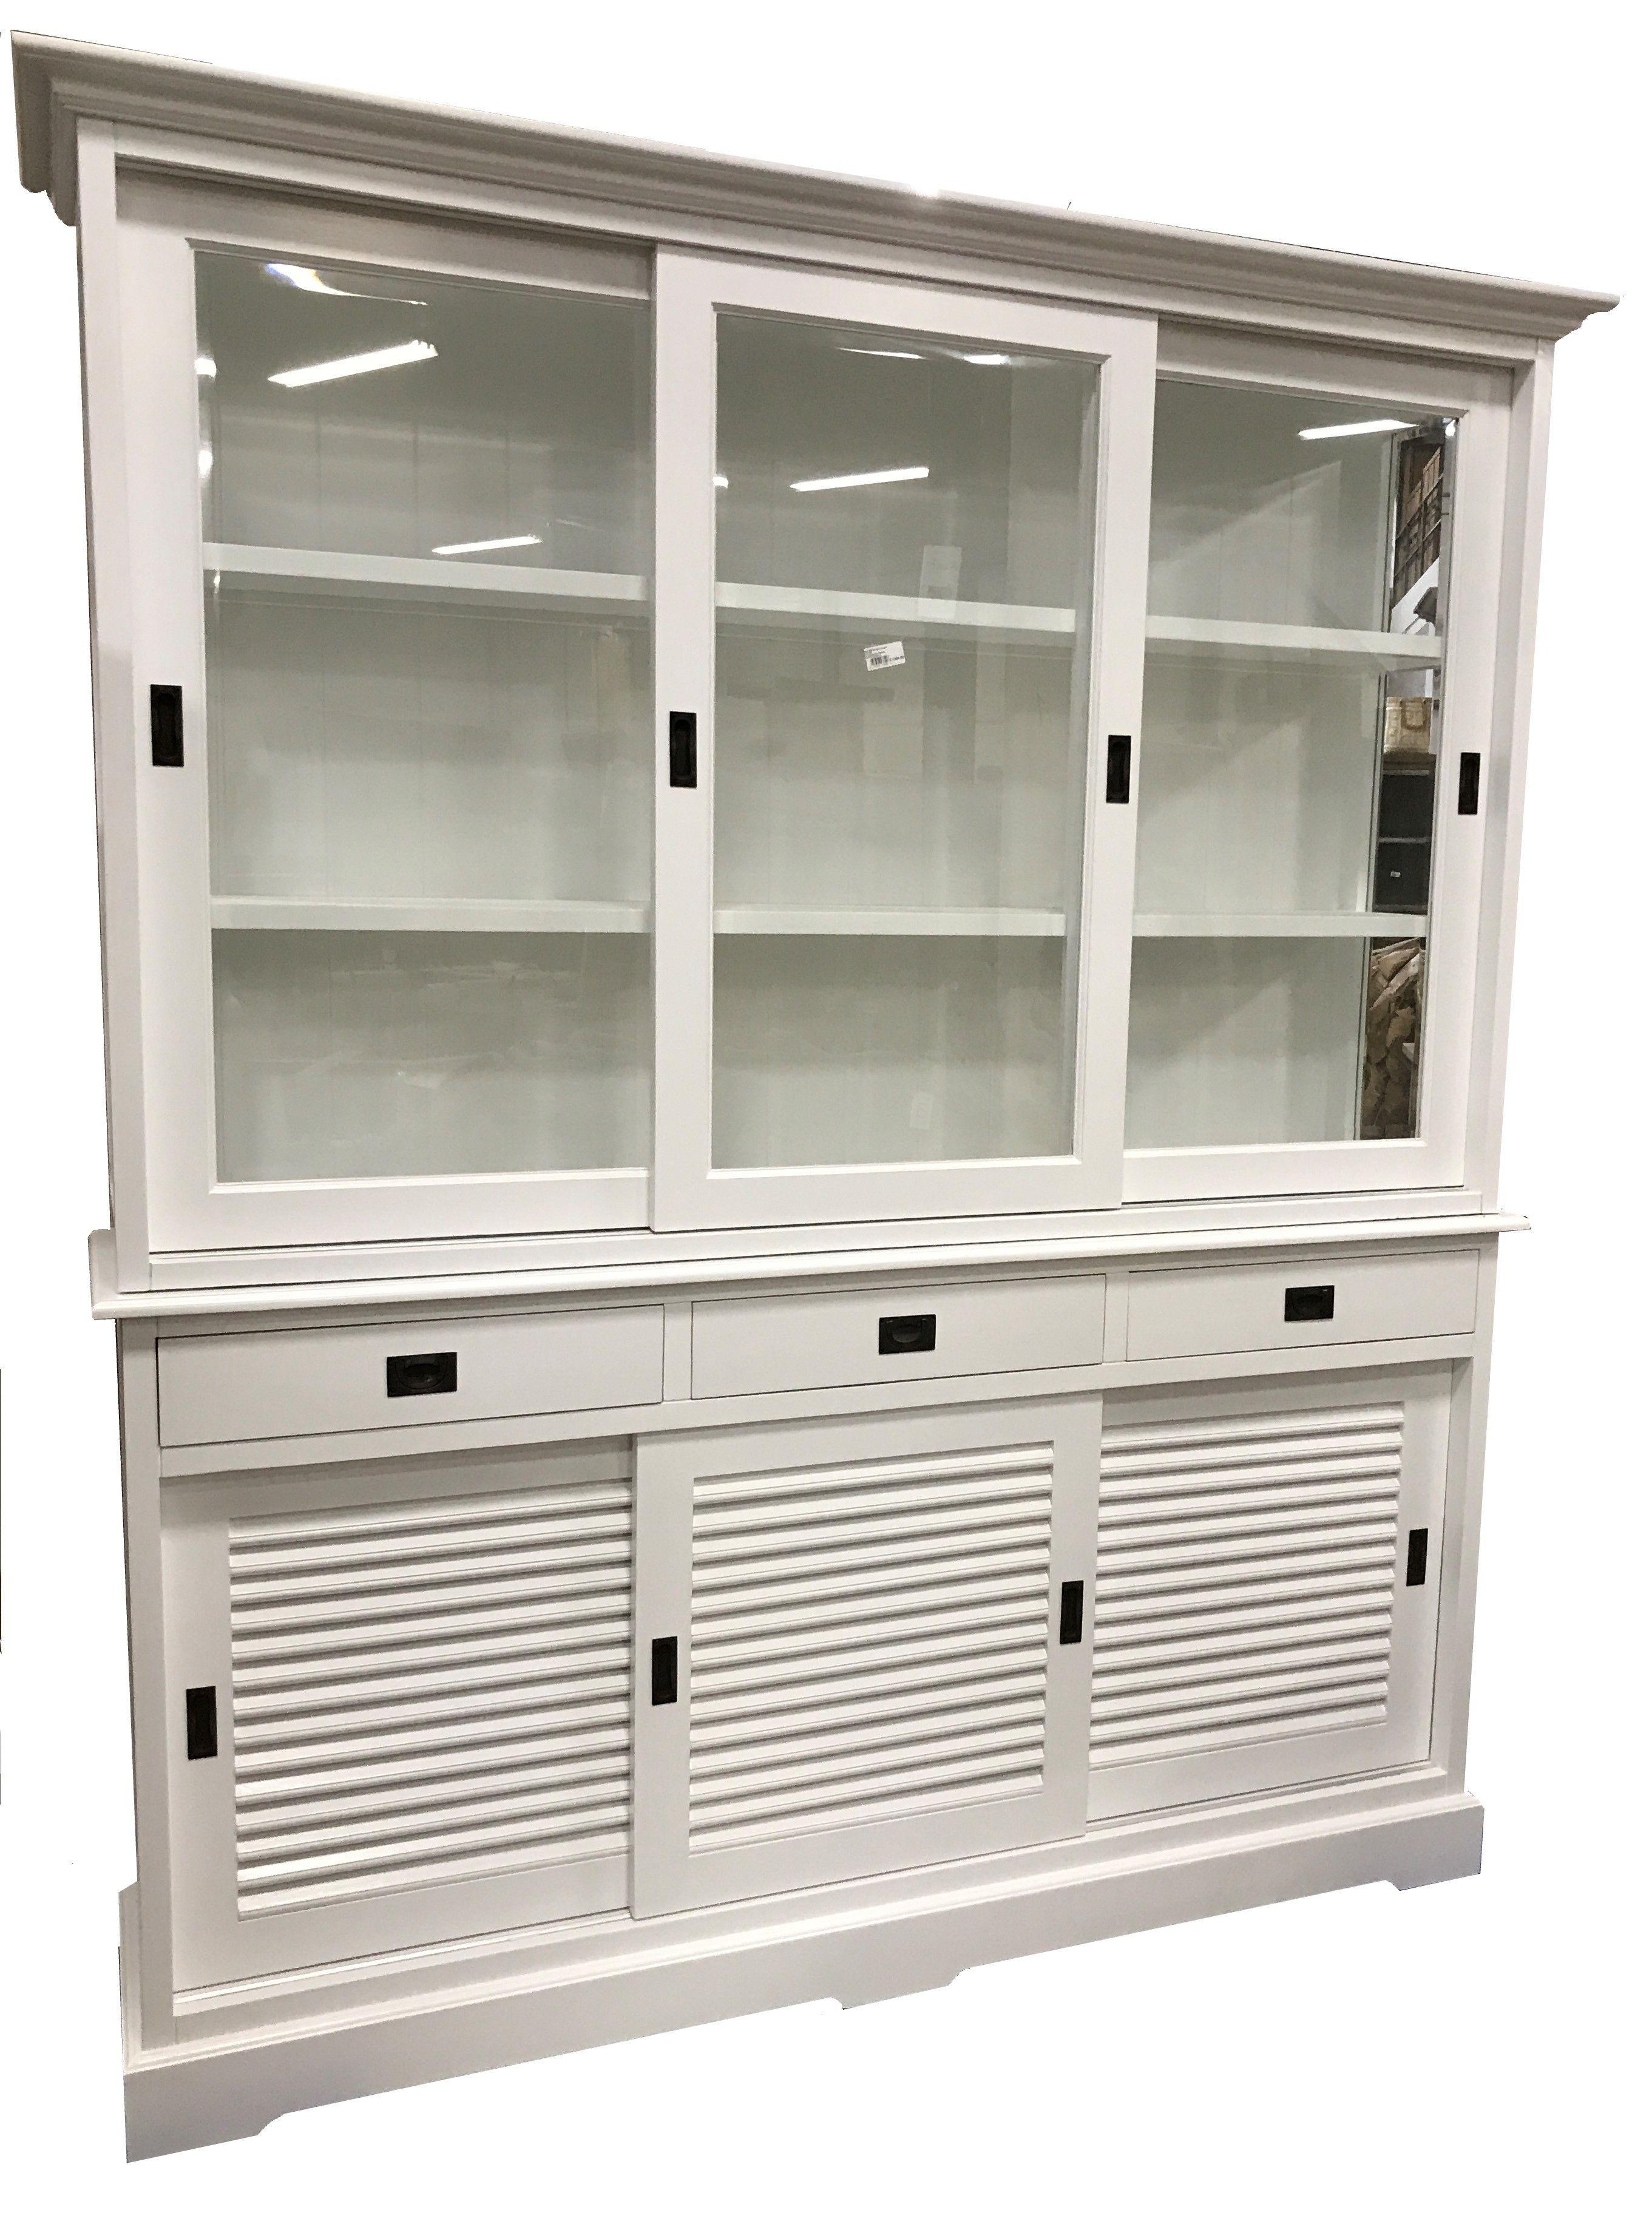 Buffetkast Wit Louvredeuren 180cm Mooie Witte Kast Met